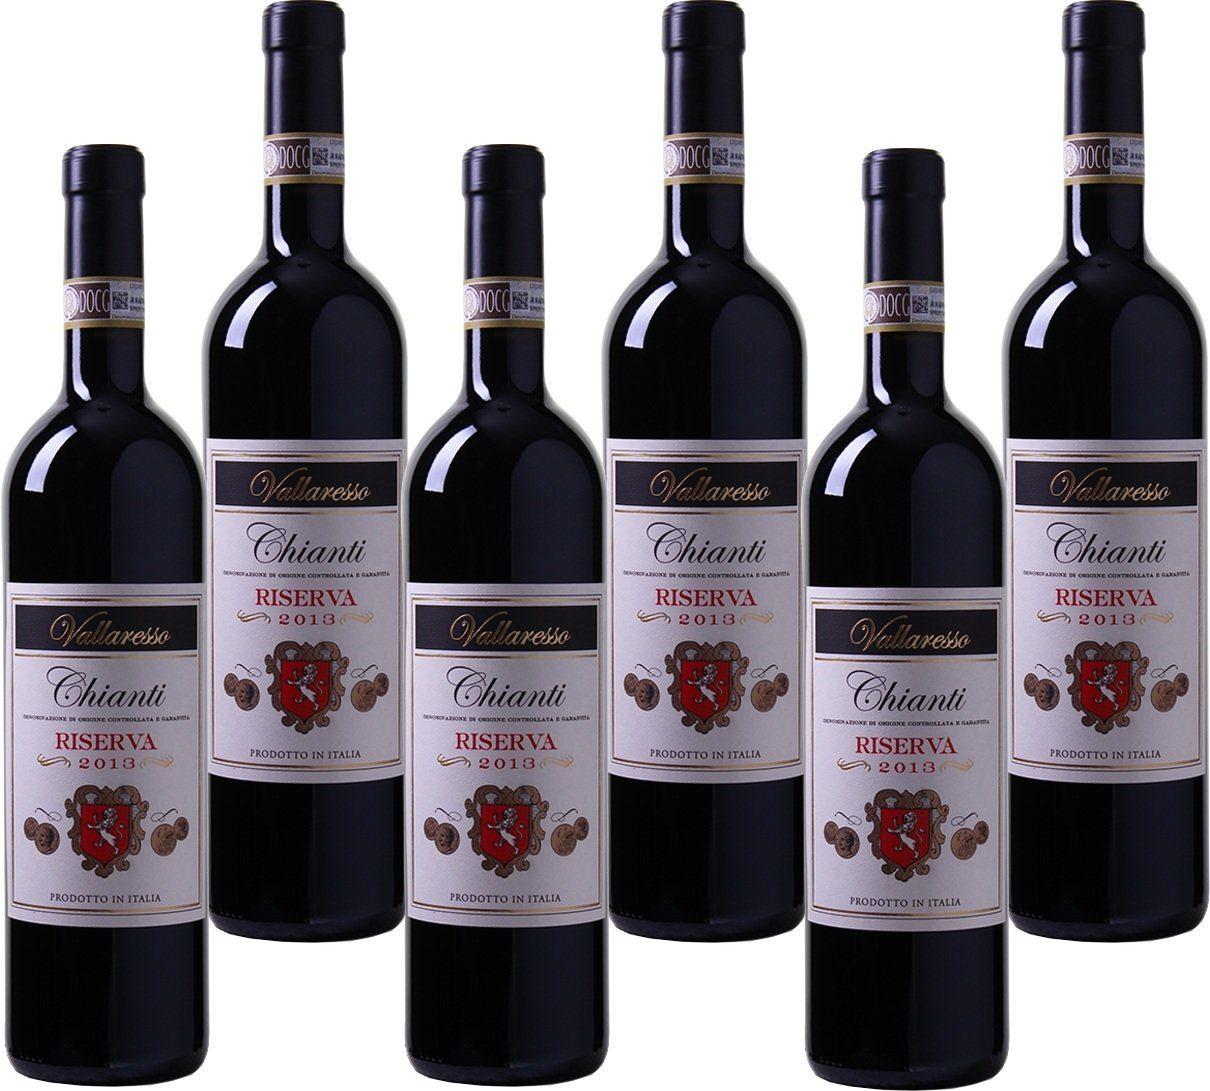 Rotwein aus Italien, 13,0 Vol.-%, 4,5 l »2013 Cantine Bonacchi«